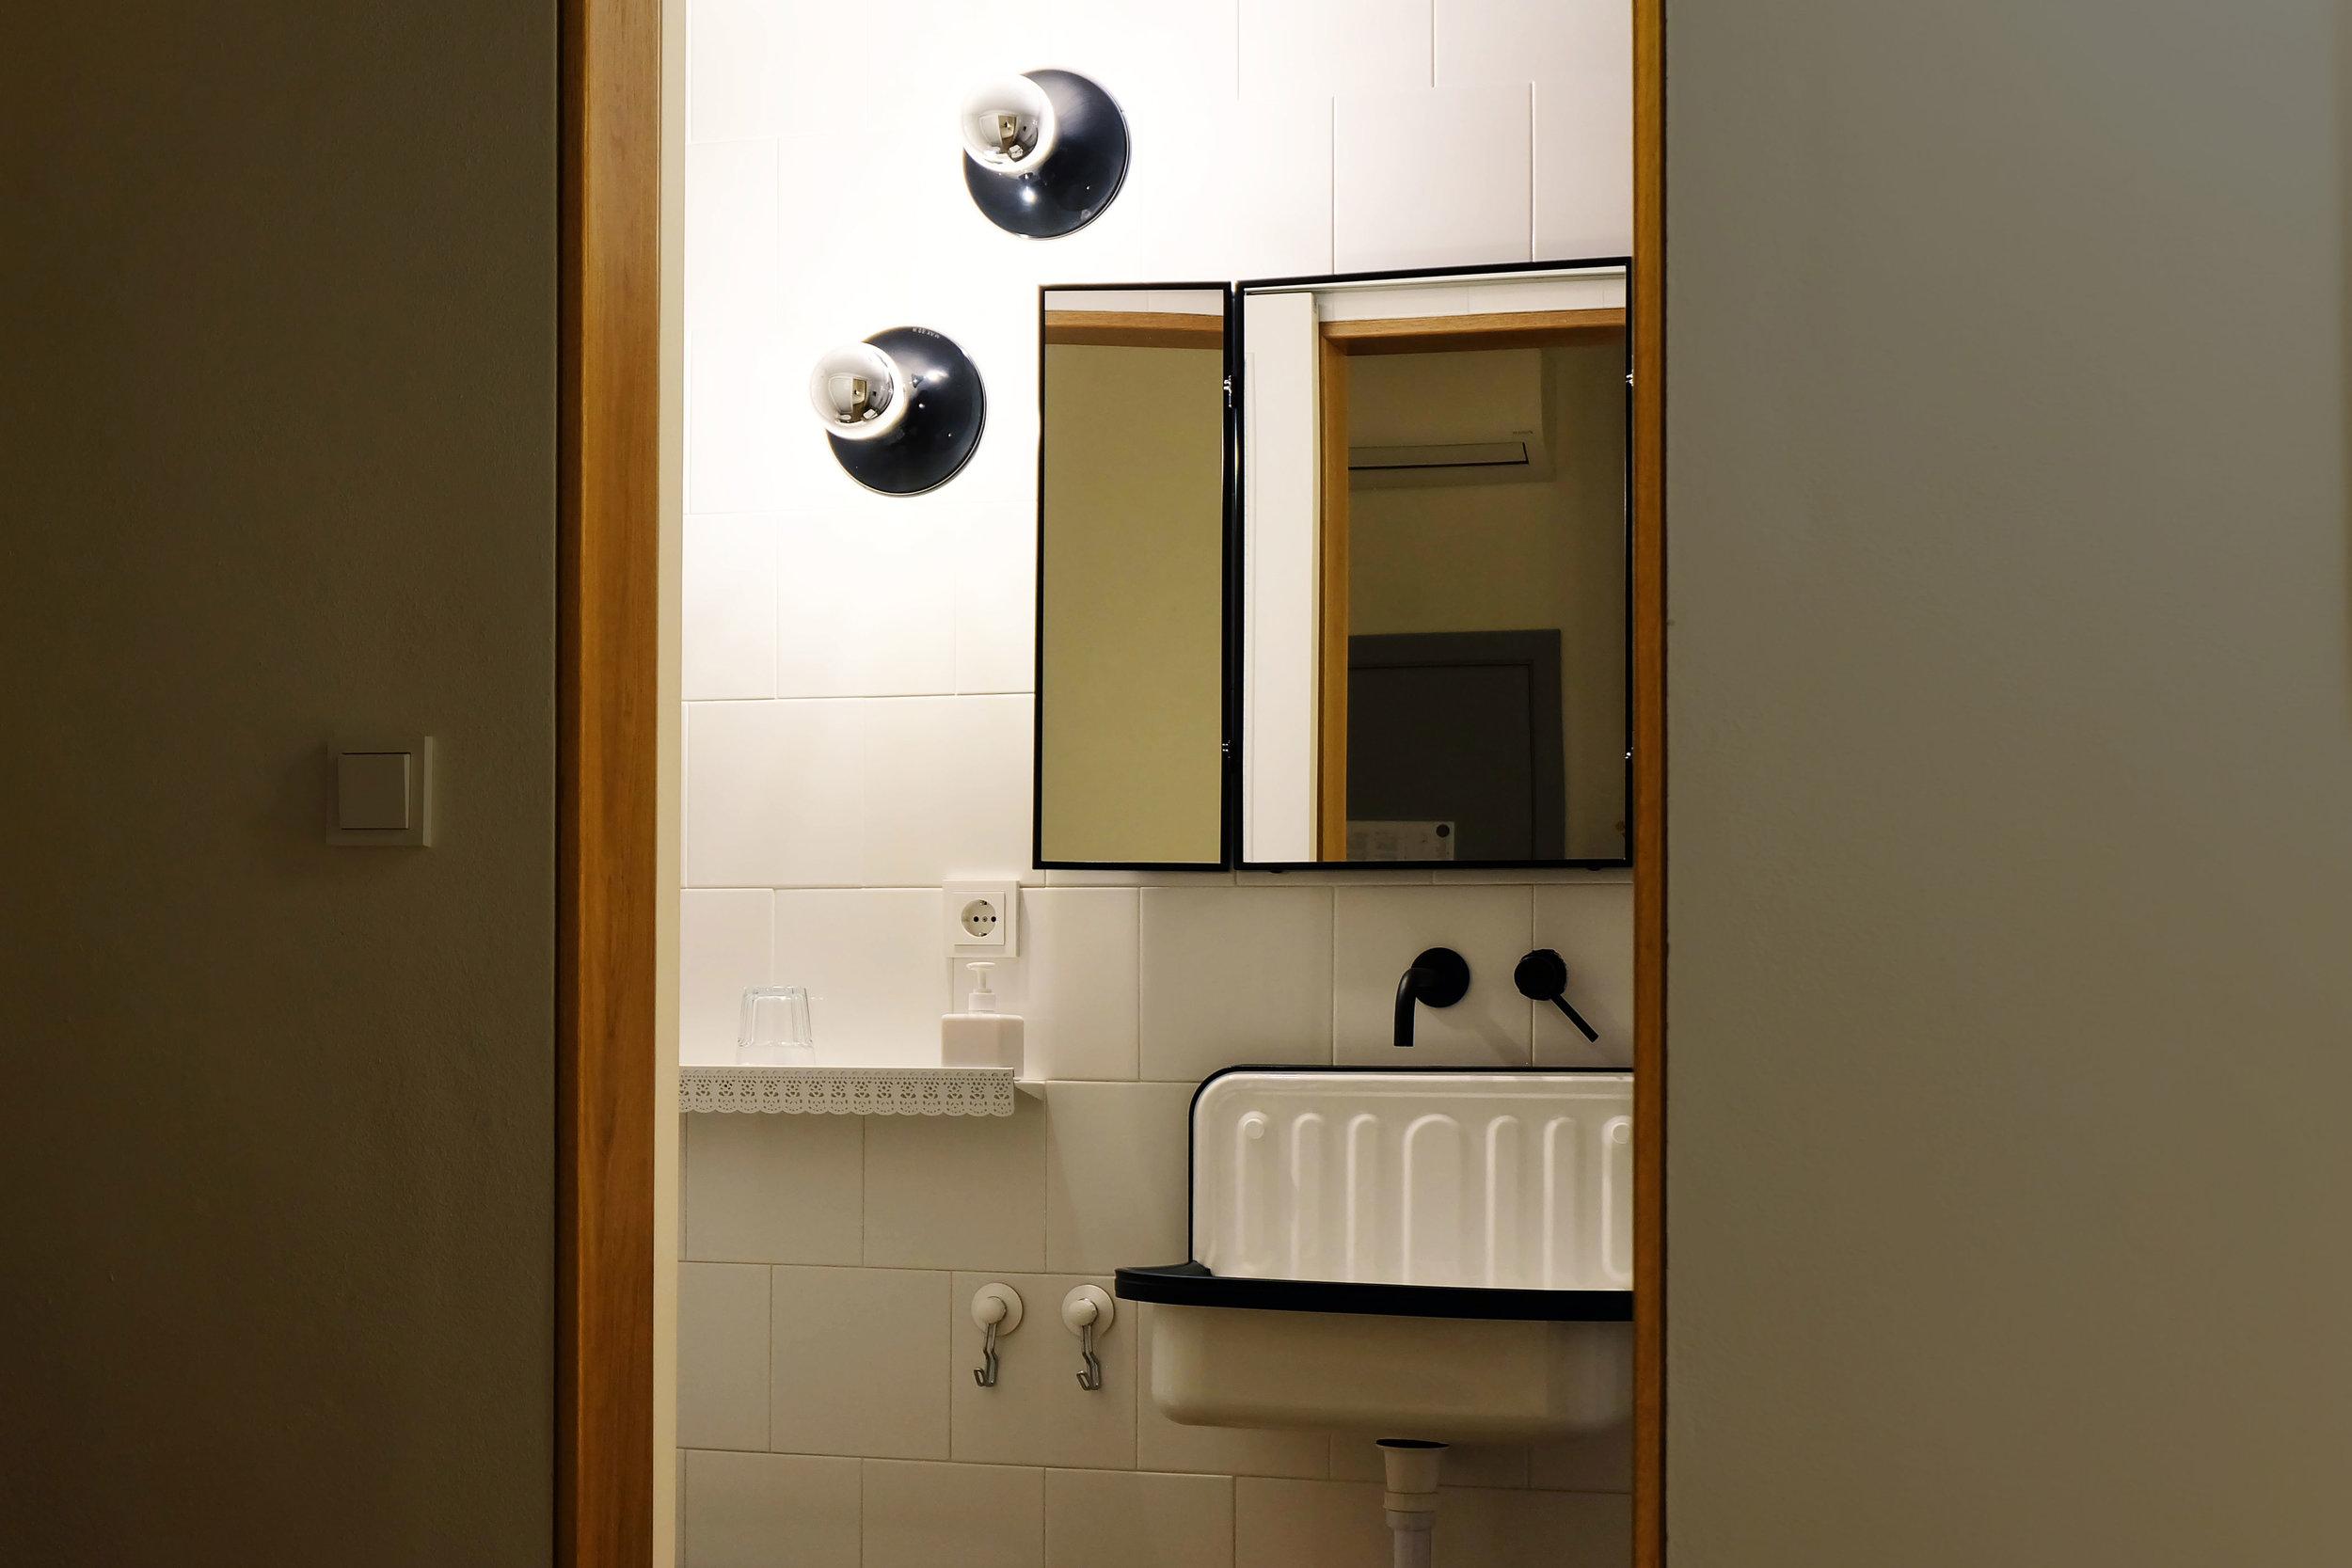 Hotel-Casa-de-Huespedes-Santa-Maria-Habitacion-10-9.jpg